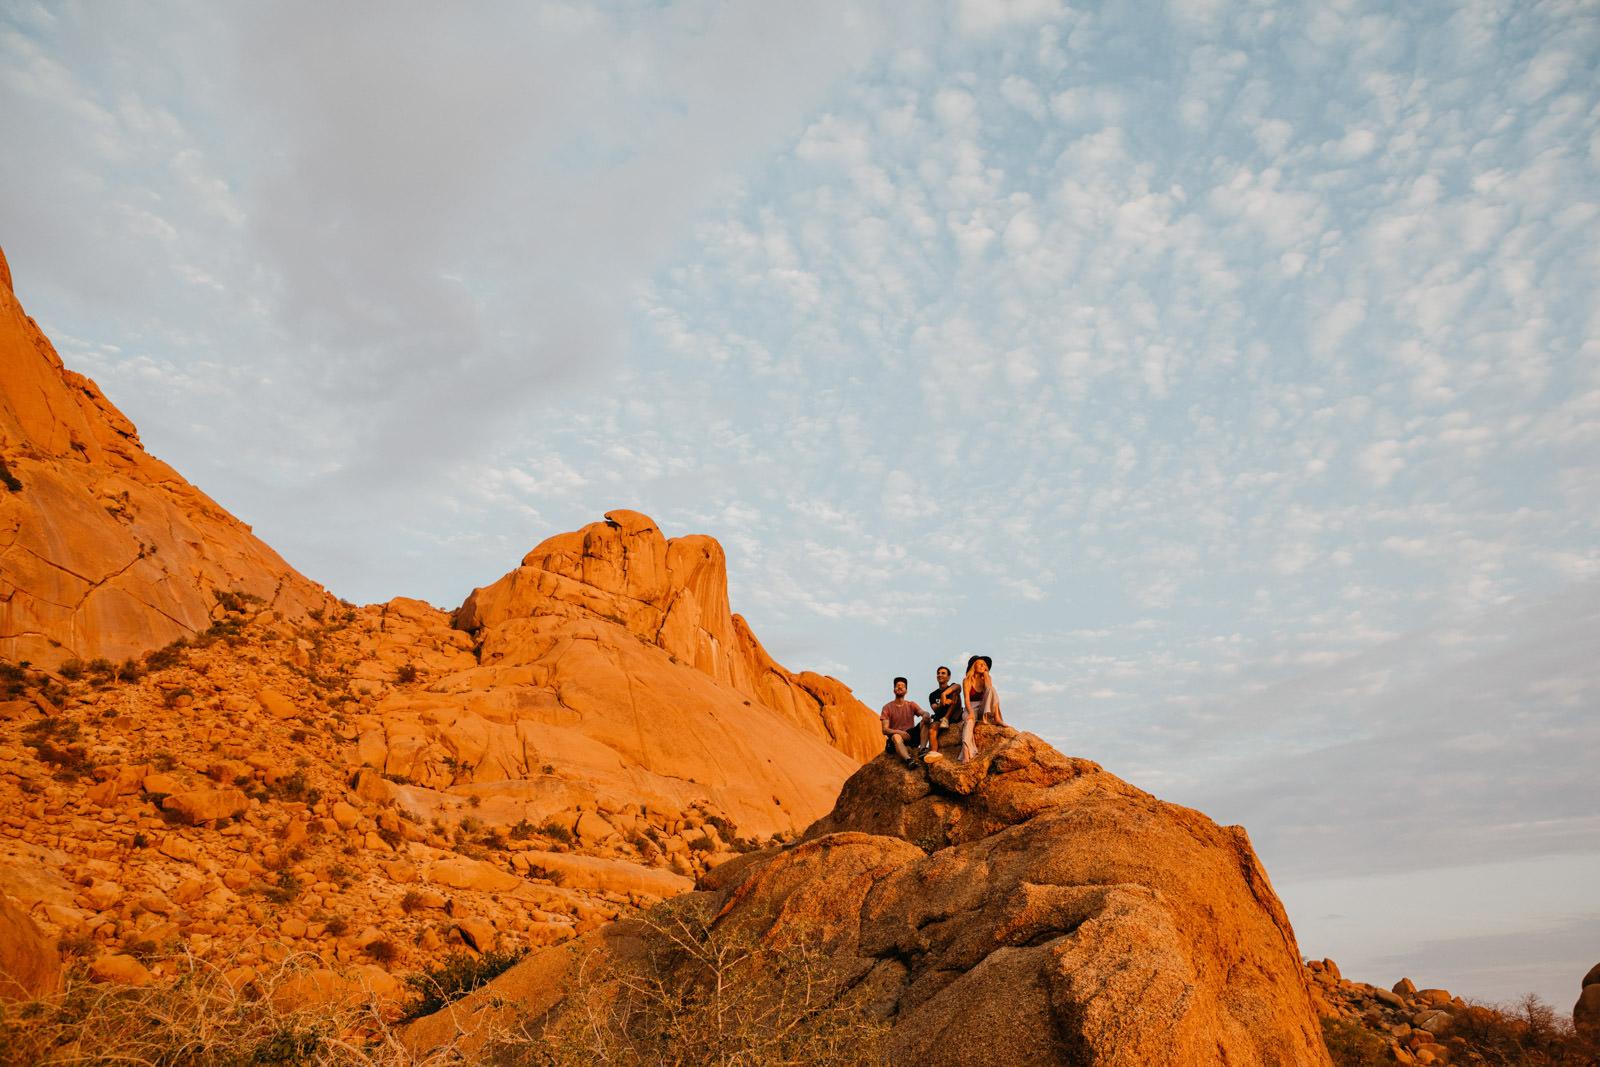 namibia_trip_rooftent_camping_roadtrip (12 von 18).jpg